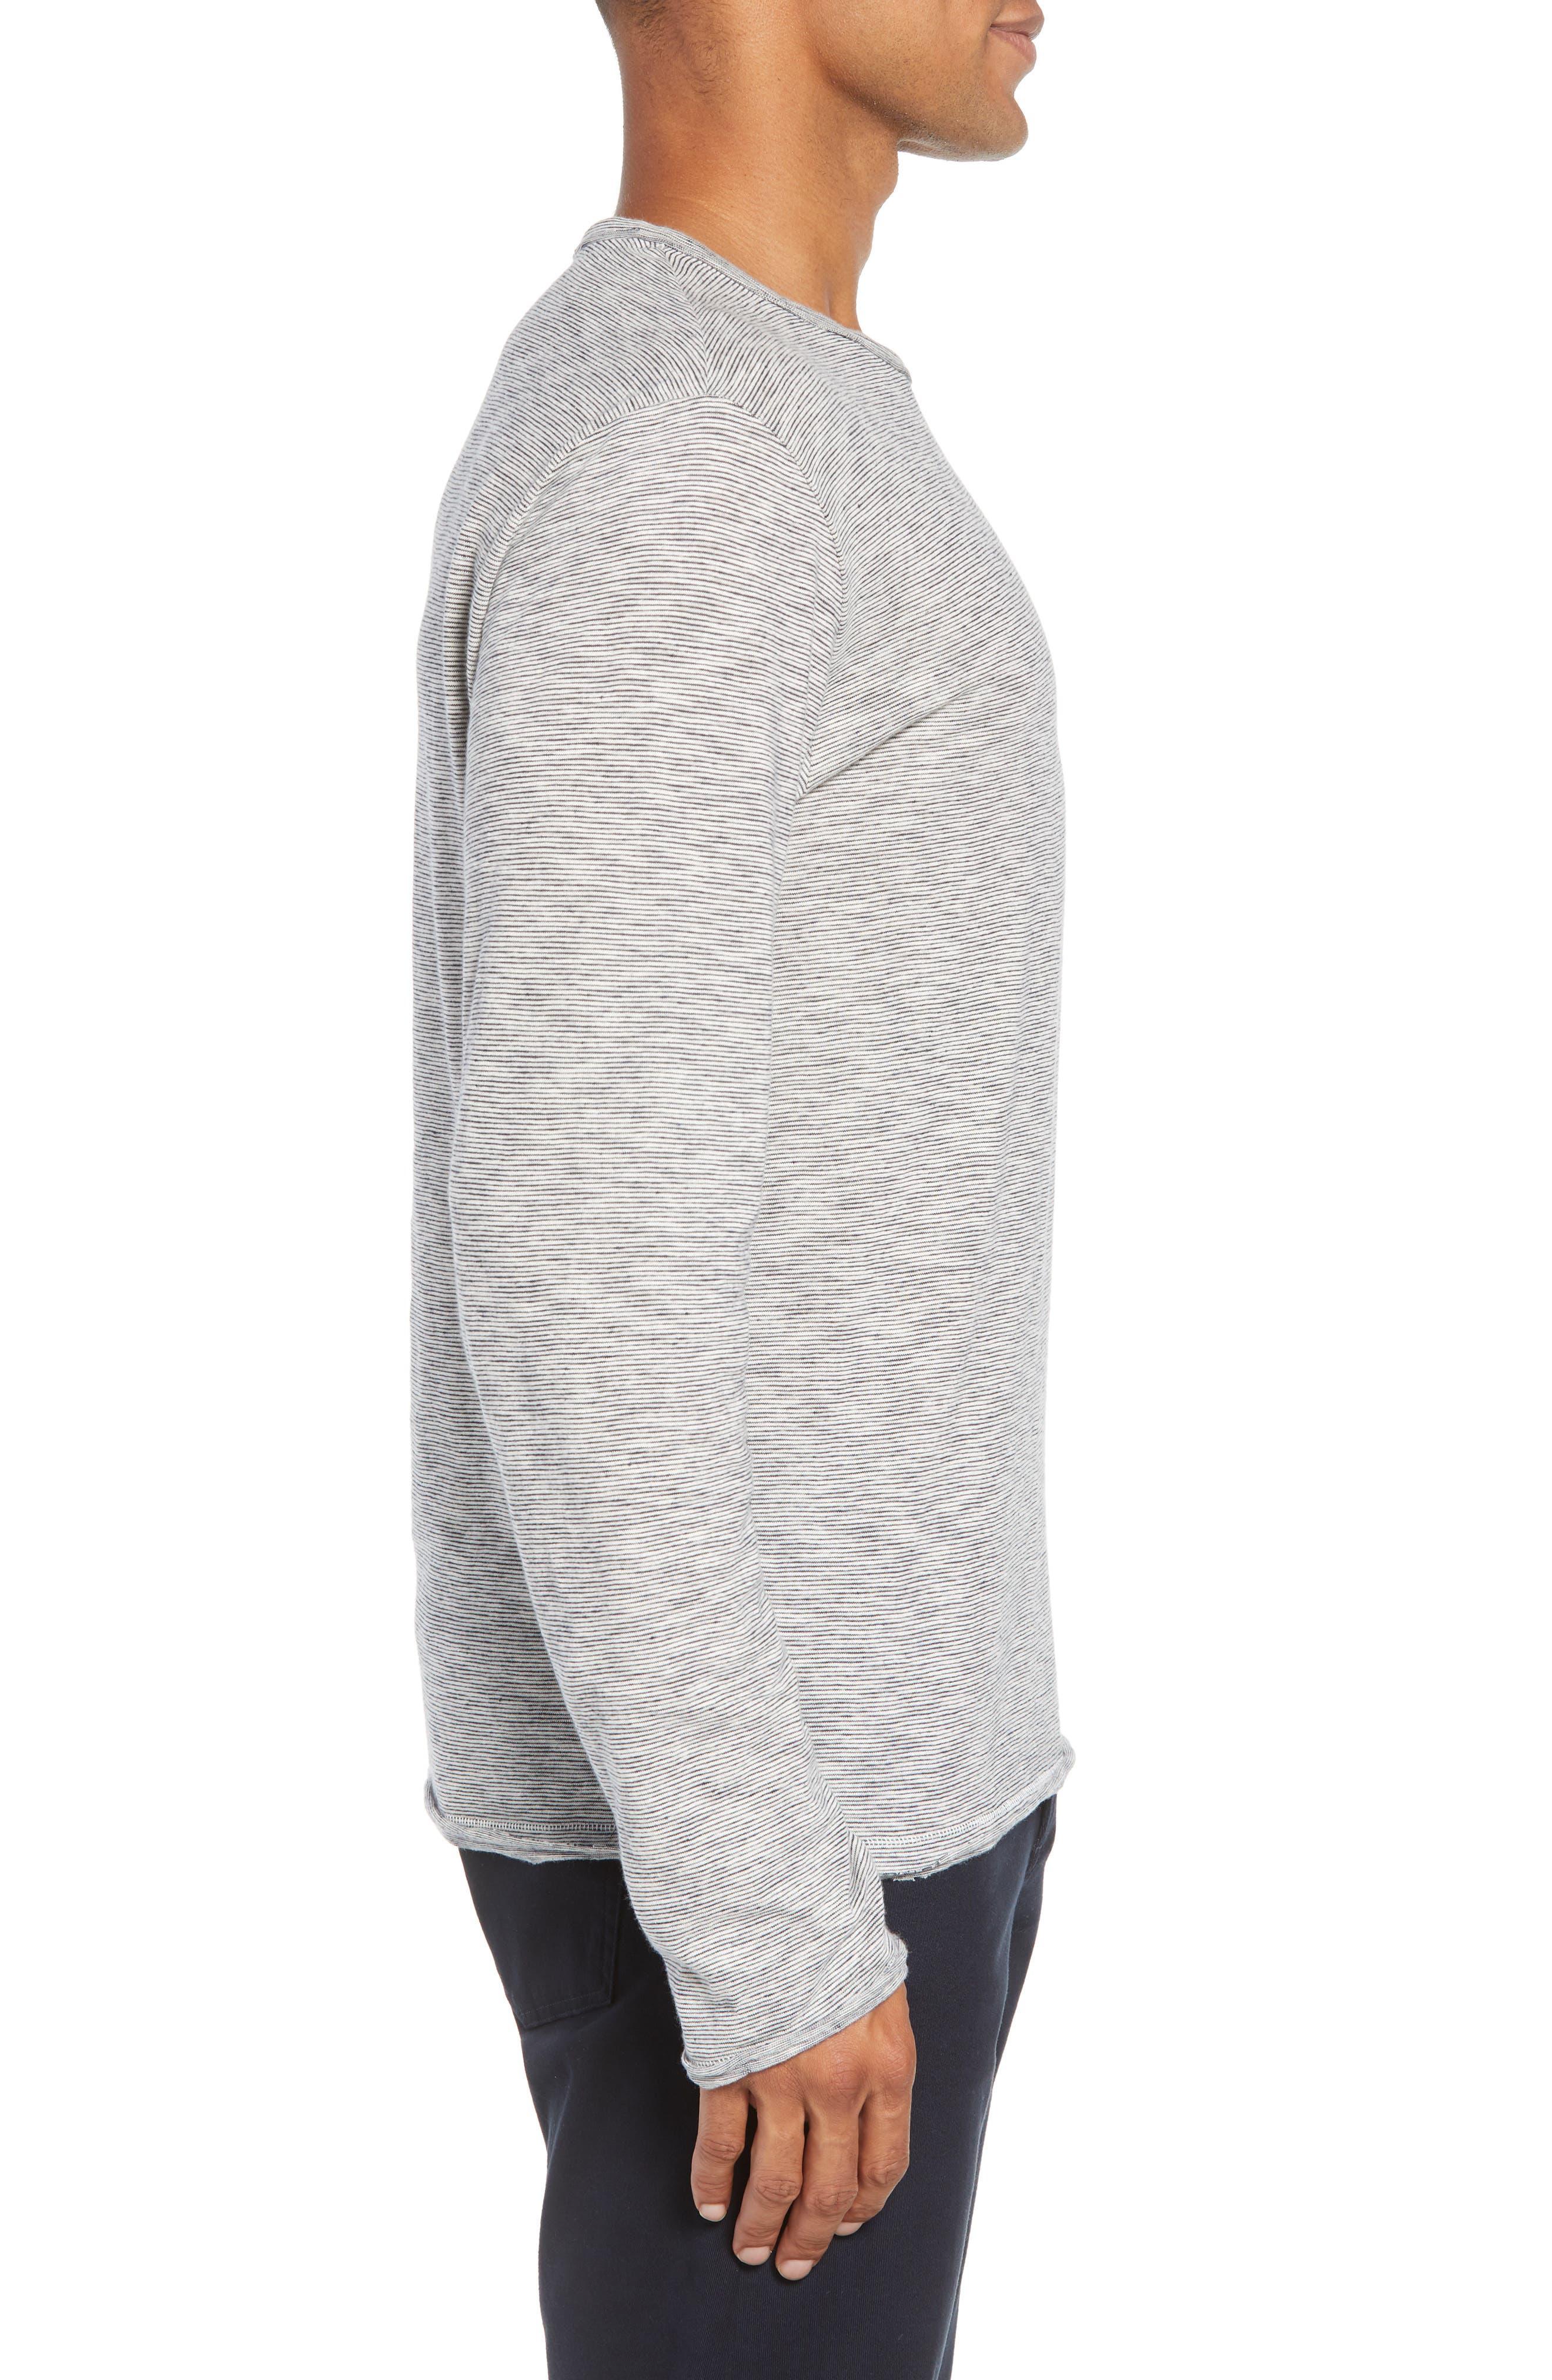 Owen T-Shirt,                             Alternate thumbnail 3, color,                             NAVY/ WHITE